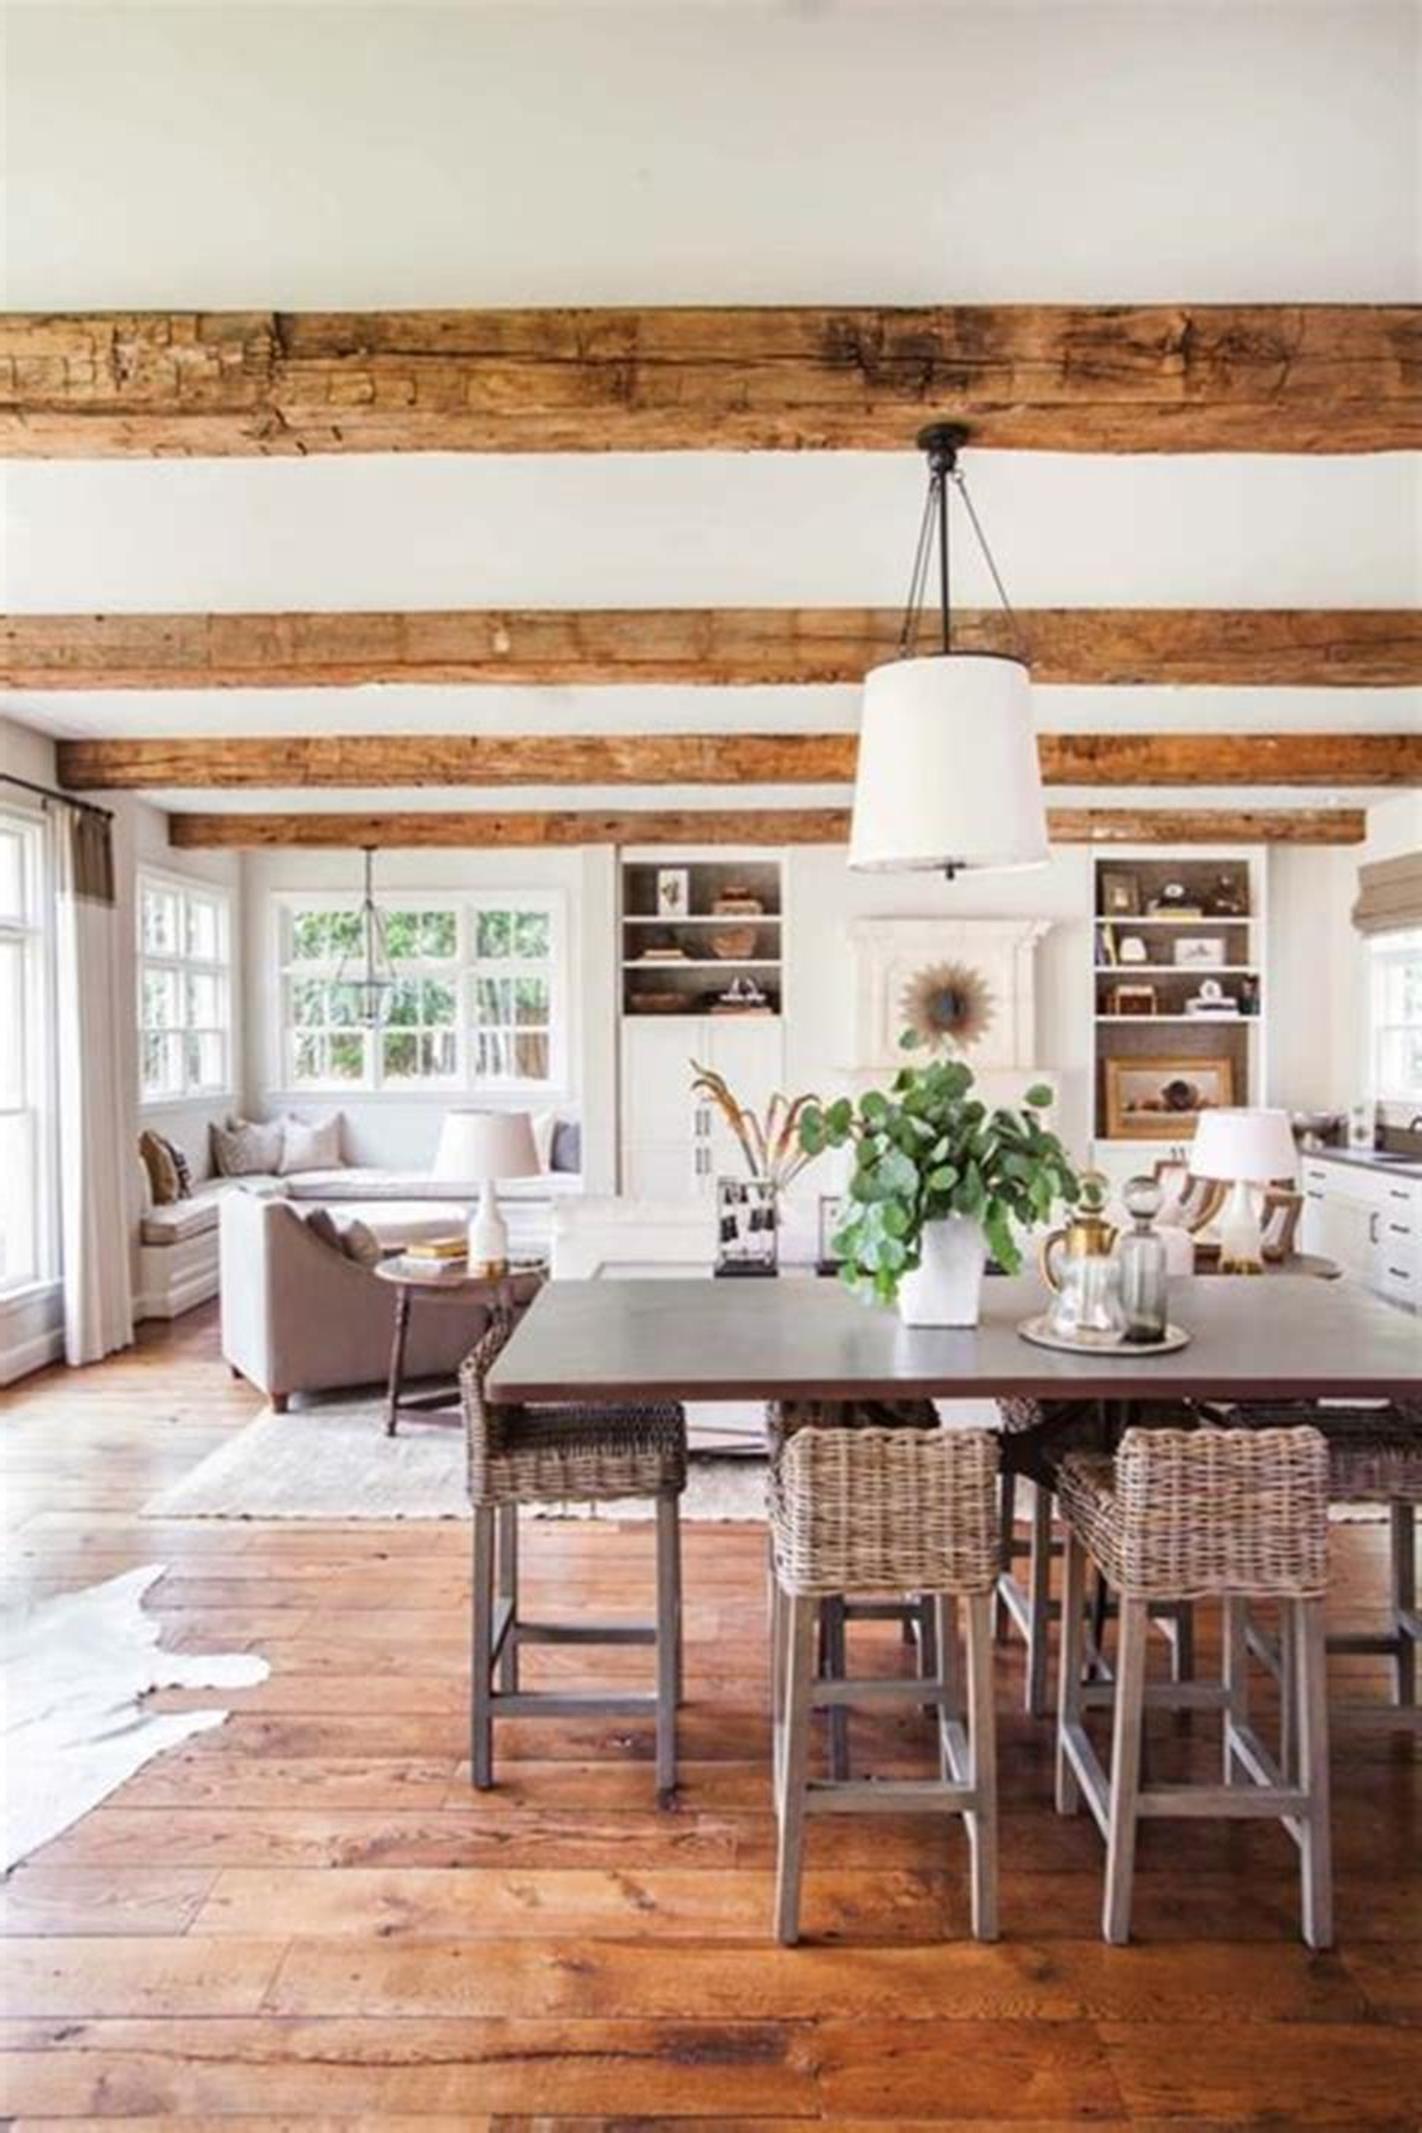 31 amazing modern farmhouse interior design ideas 23